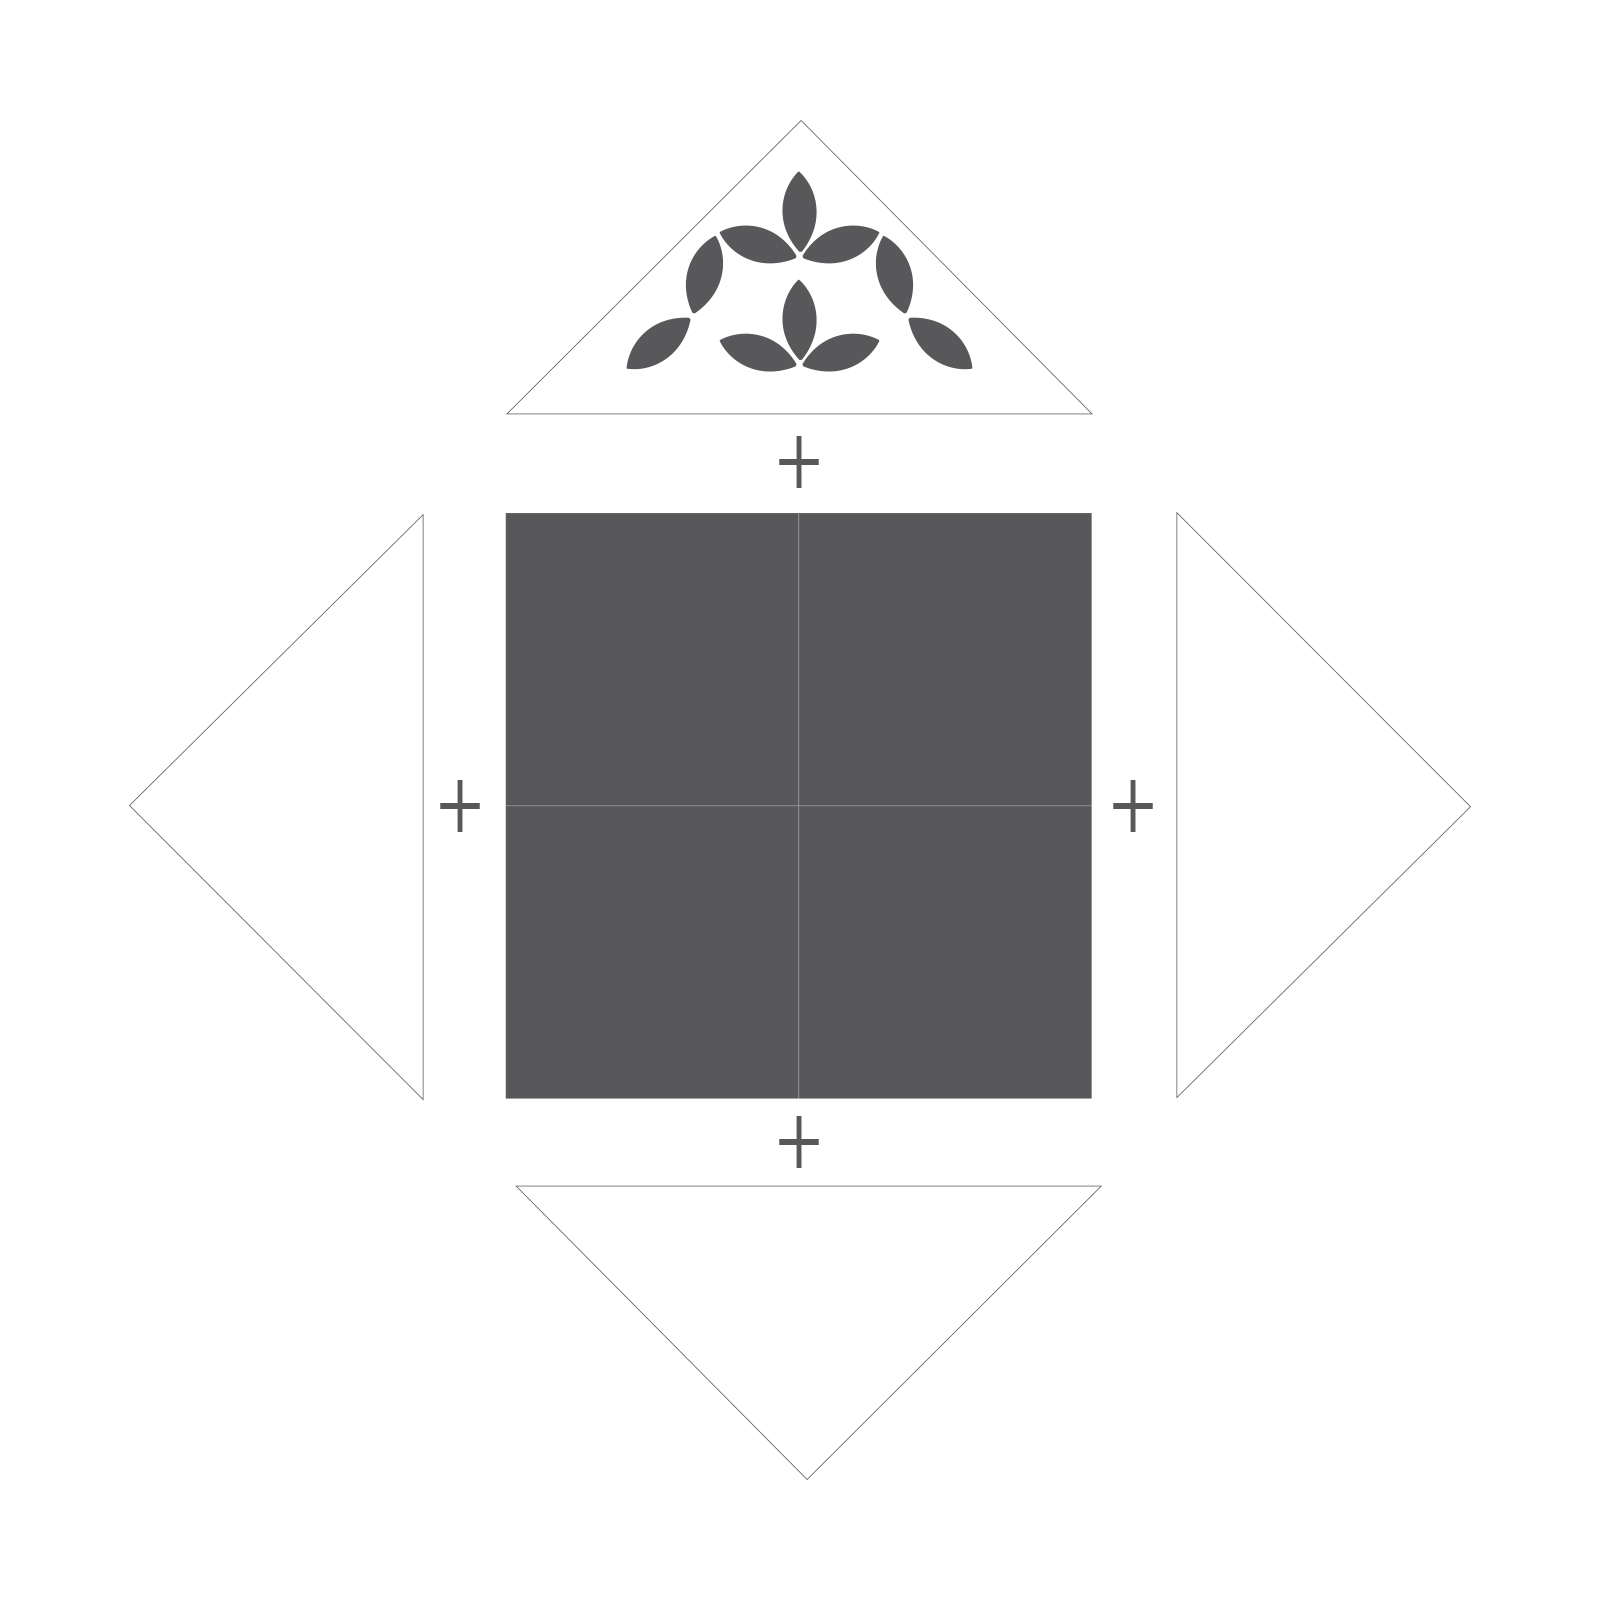 instruction:Diagrams 10 & 11